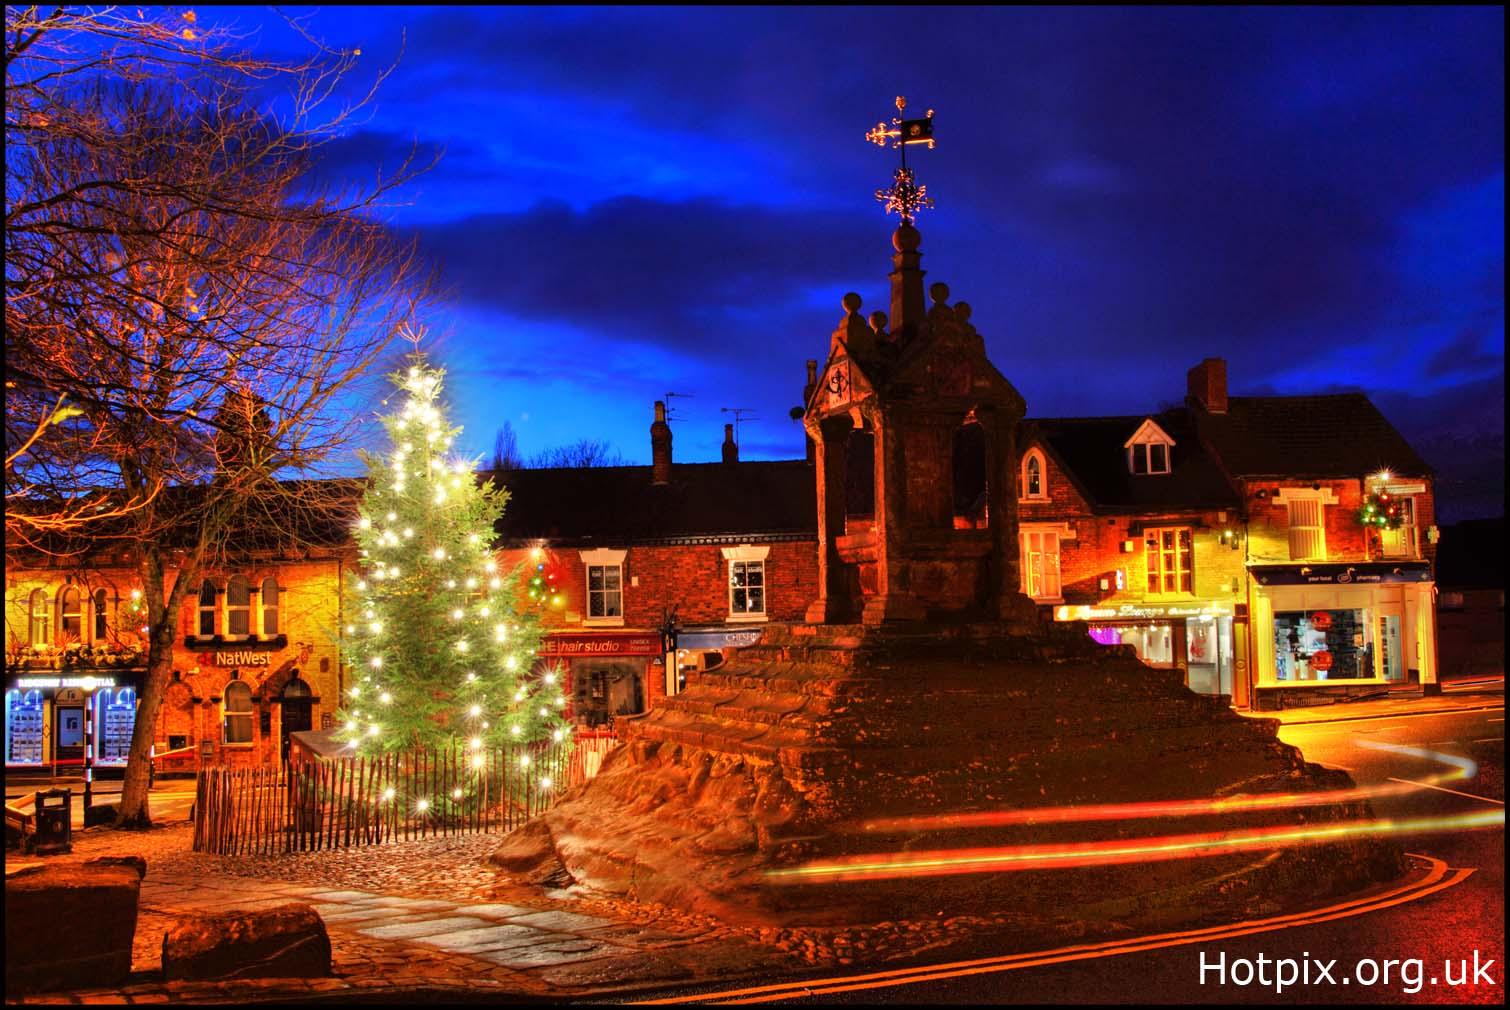 Lymm,village,dusk,night,shot,nightshot,tripod,blue,sky,magic,hour,cross,square,cheshire,england,north,west,xmas,christmas,tree,shots,car,trail,trails,cartrails,december,tonysmith,tony,smith,hotpixuk,hotpix,uk,hotpixorguk,rectory,lane,pepper,street,st,christmas lights,lights,festive,365days,photo,photos,photography,photographer,www.hotpix.org.uk,www.thewdcc.org.uk,thewdcc.org.uk,wdcc.org.uk,Warrington,society,District,Camera,club,photographic,SLR,DSLR,group,GYCA,Bellhouse,bellhouse Club,HDR,high dynamic range,highway,road,noche,nuit,hotpix.rocketmail.com,hotpixuk.rocketmail.com,contact.tony.smith.gmail.com,tony.smith.gmail.com,tonys@miscs.com,tony.smith@mis-ams.com